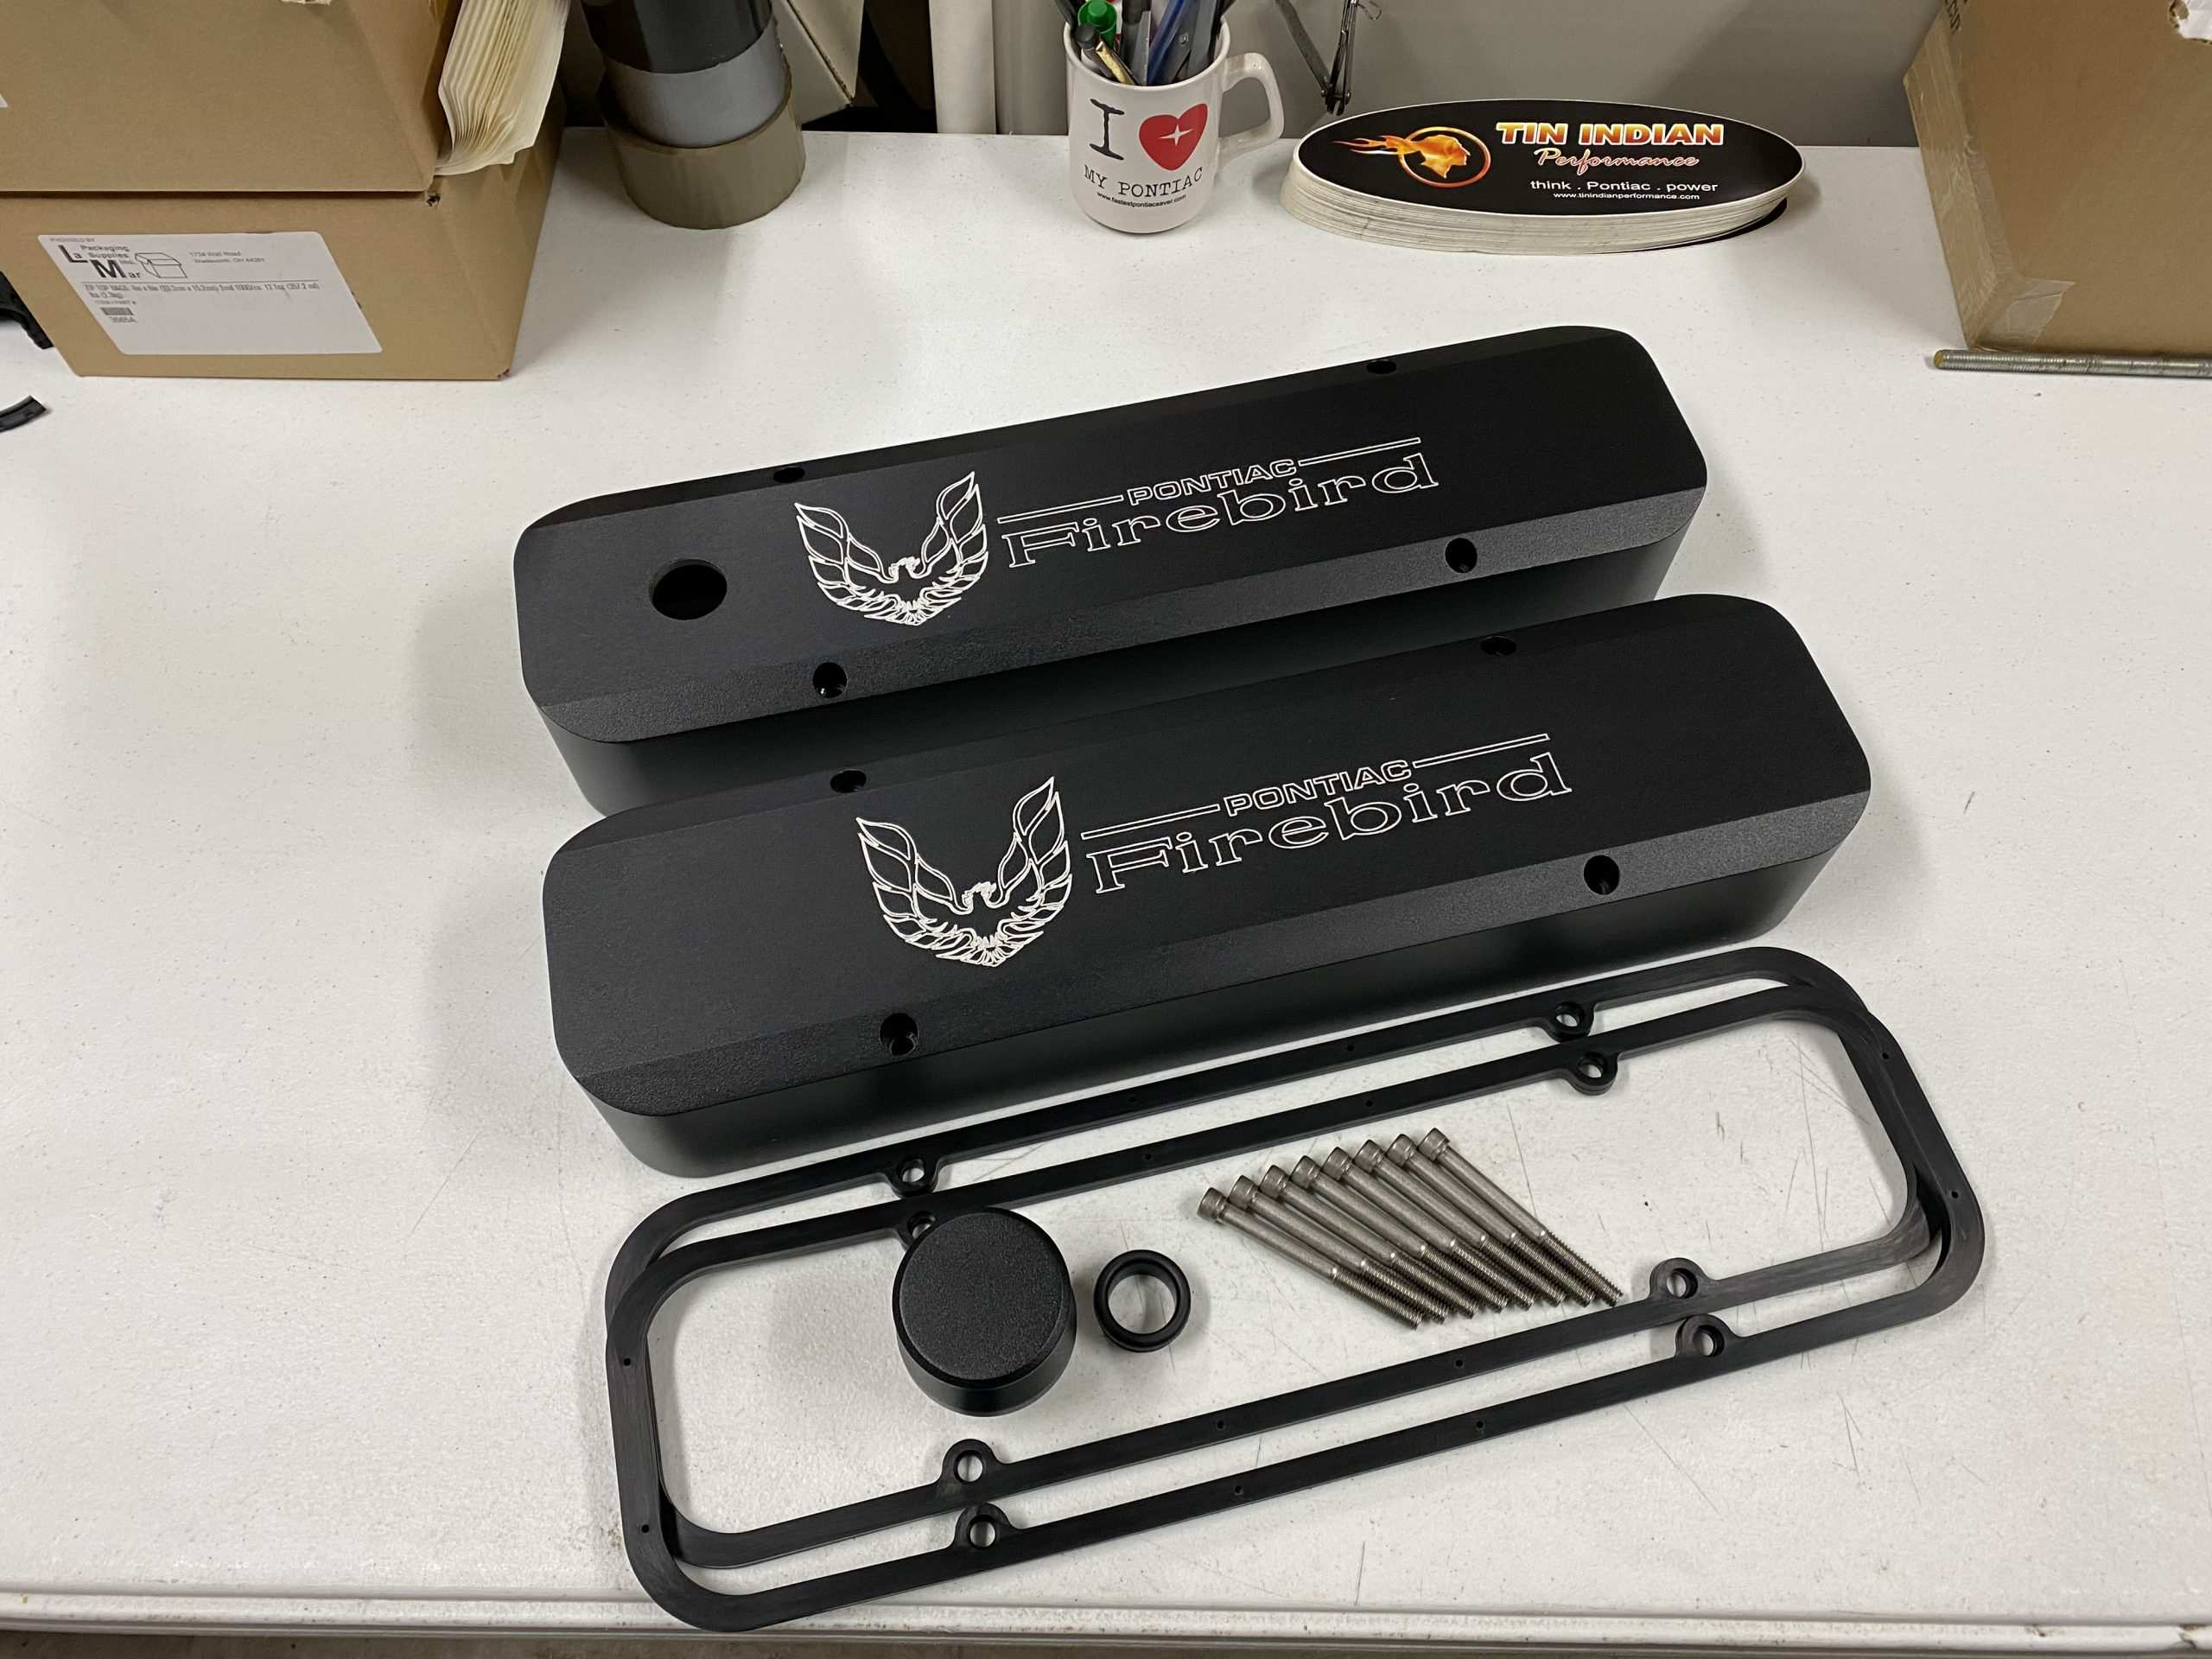 Disco Sled and Pontiac Firebird logo black satin coating 3